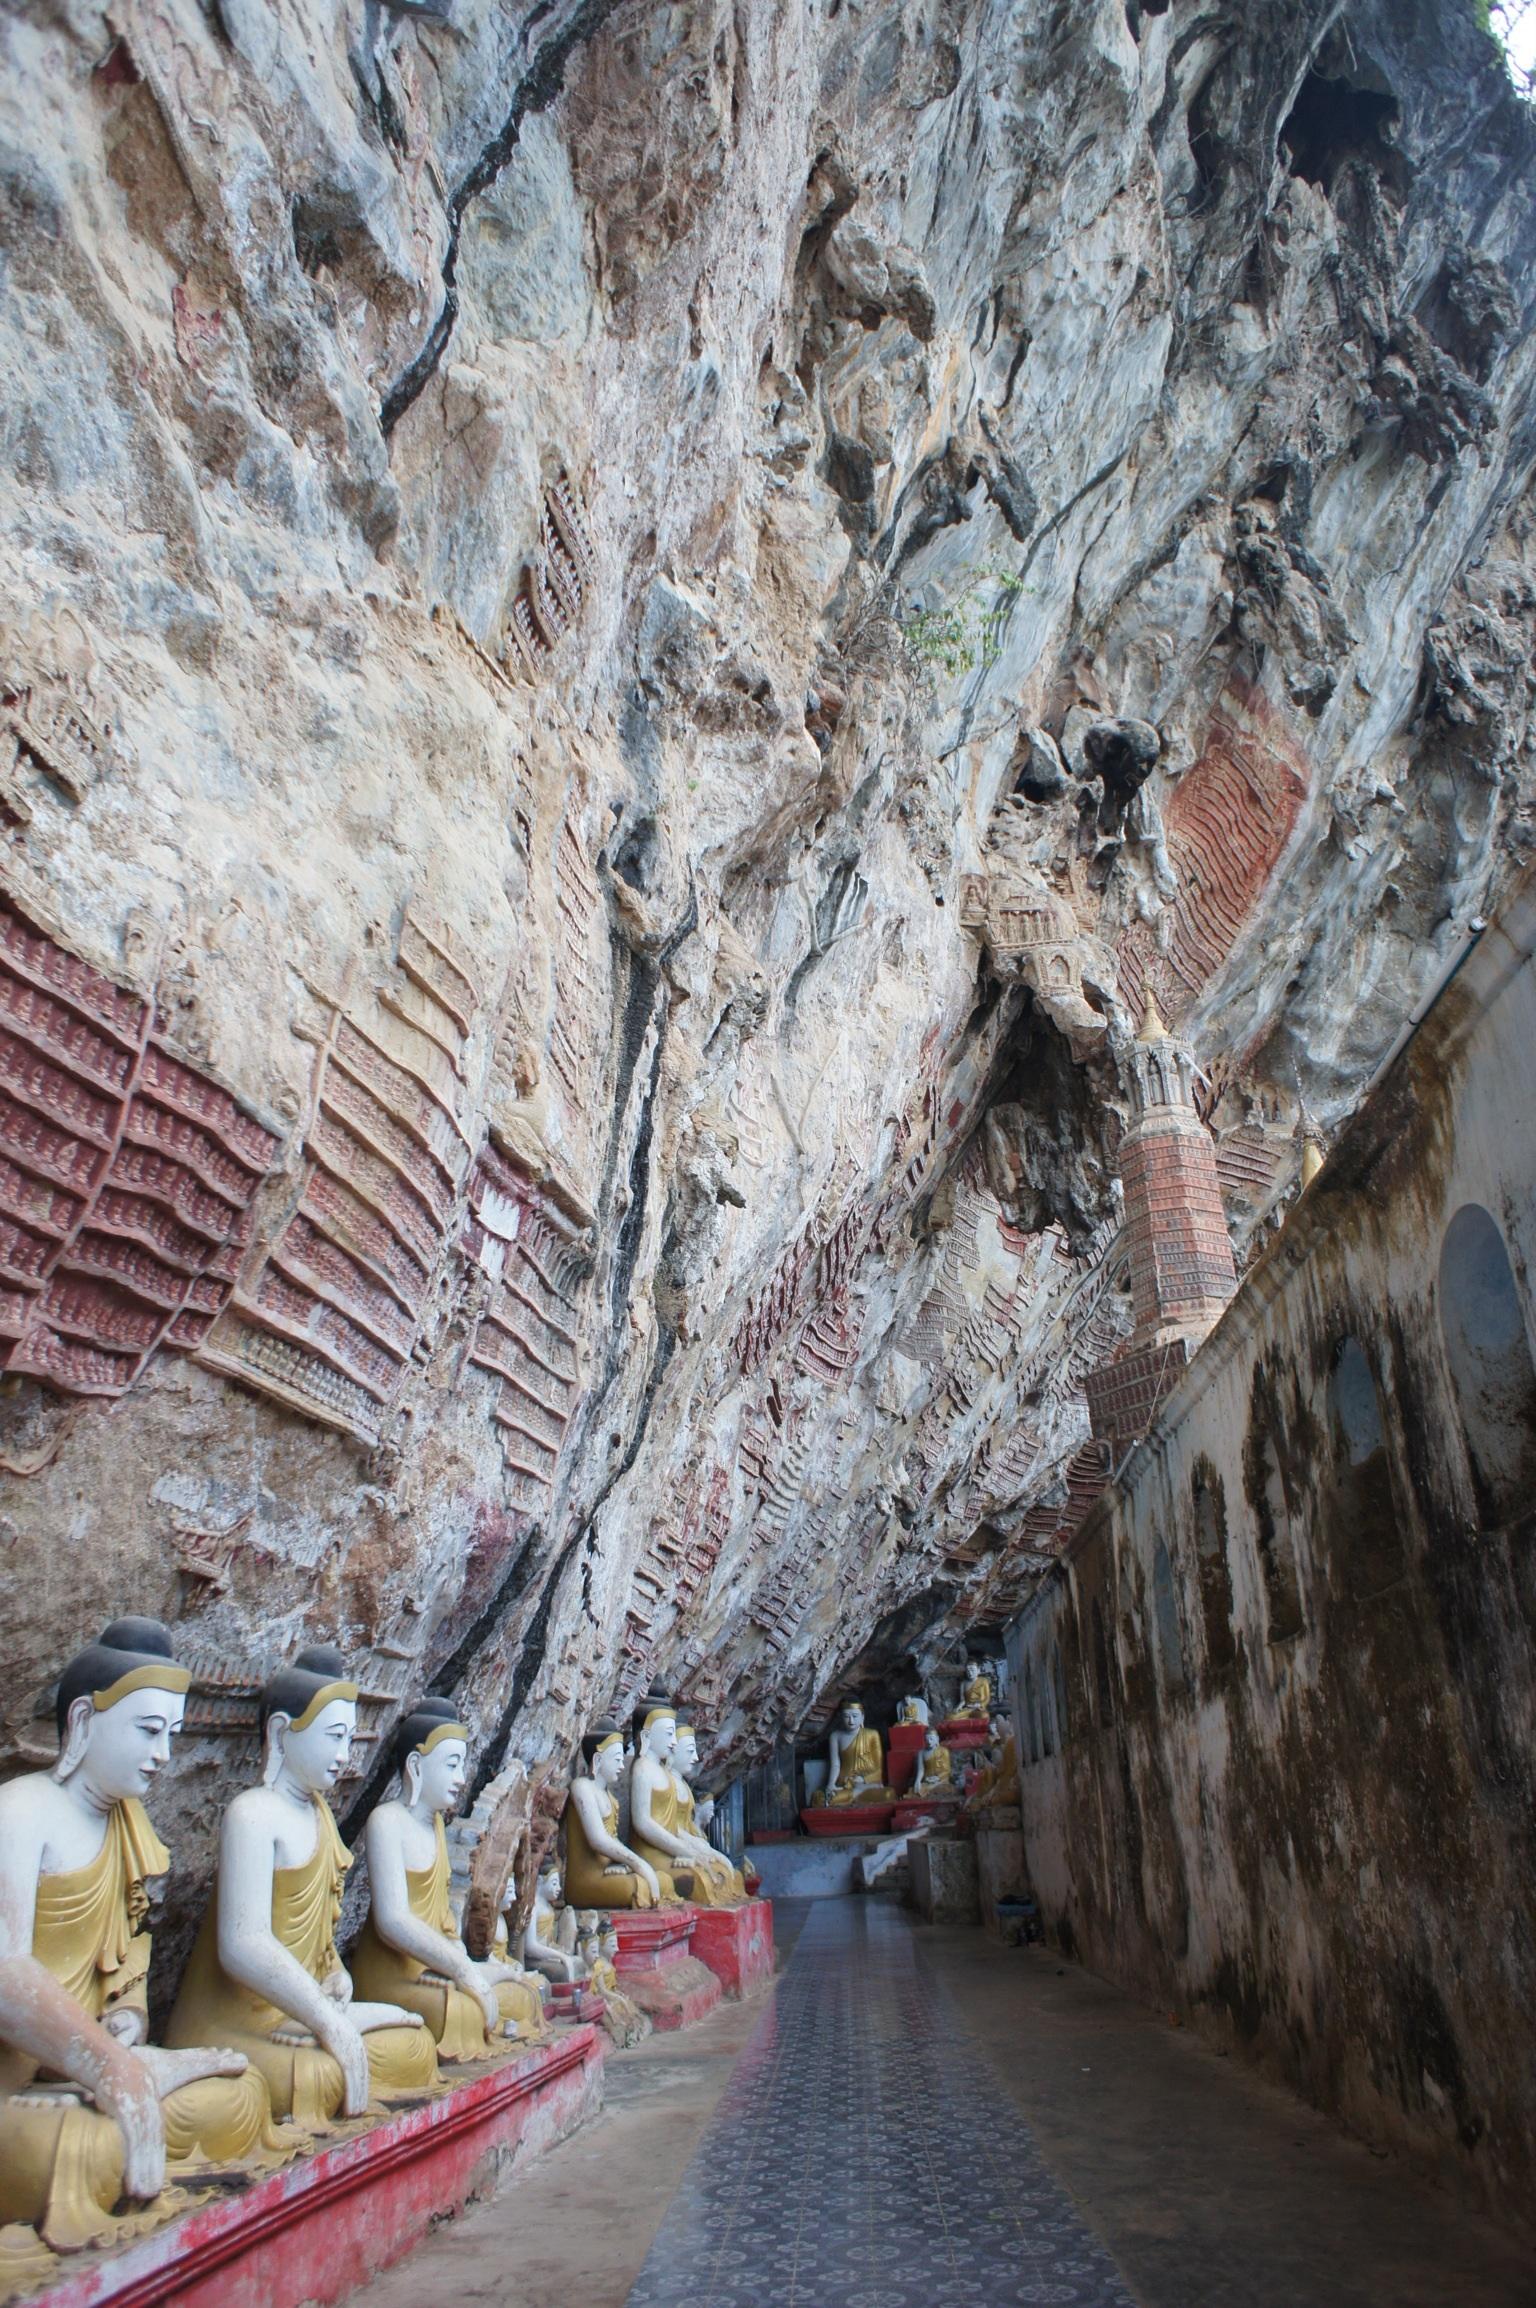 Kawgoon Caves